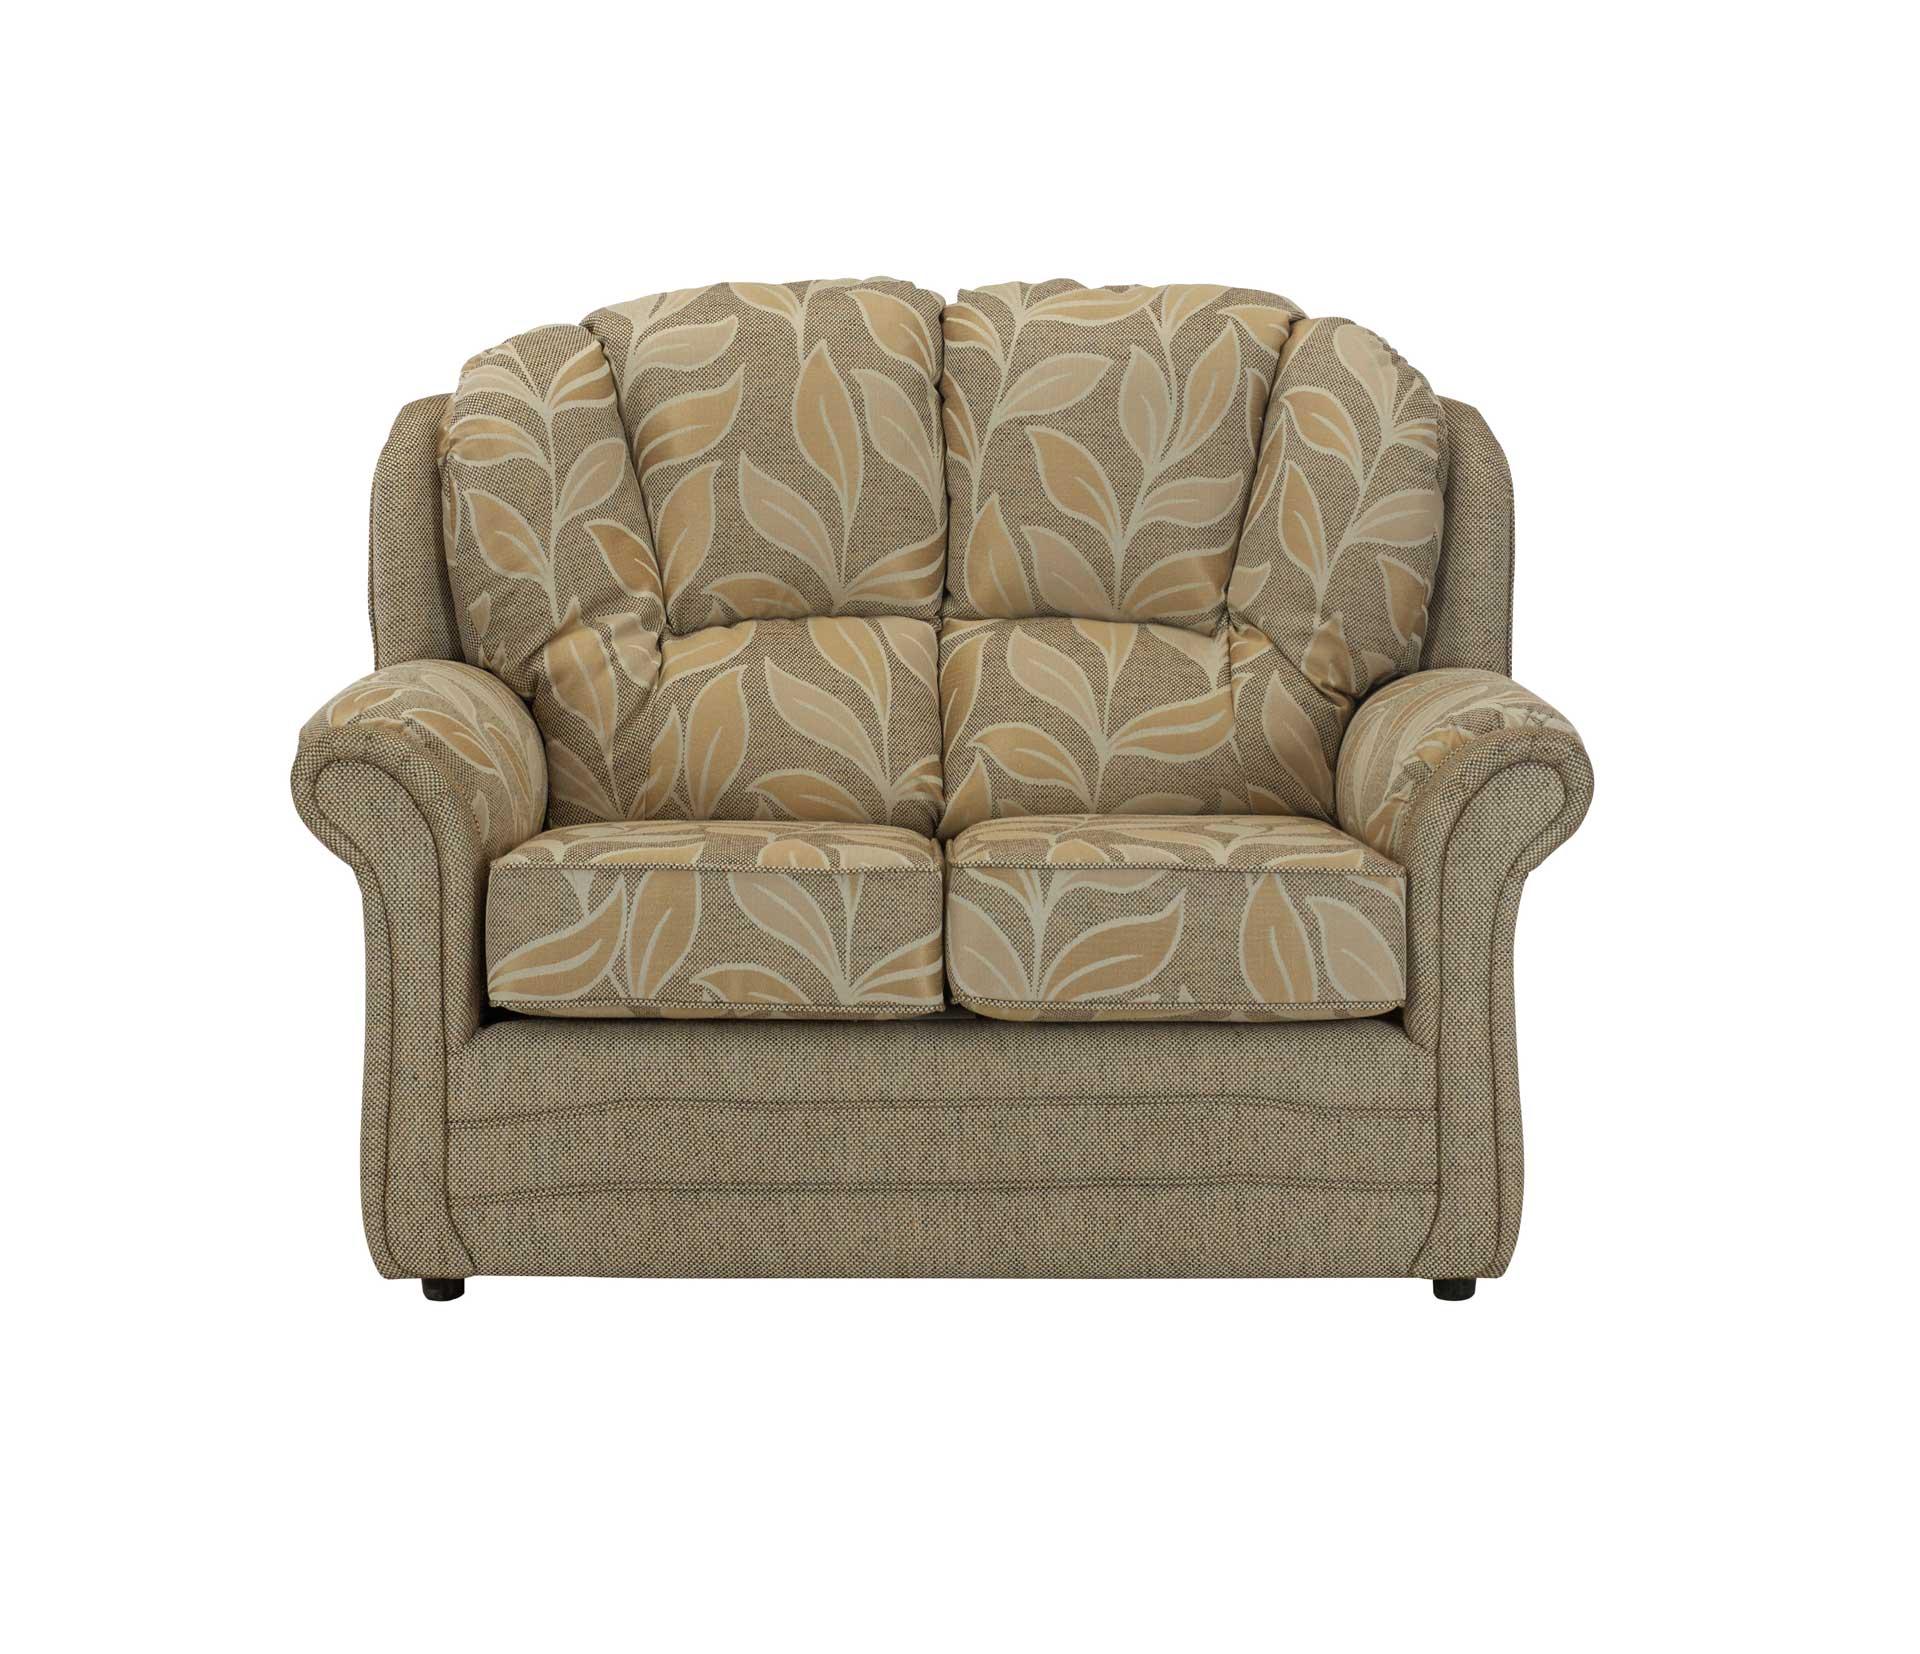 Lottie 2 Seater Sofa